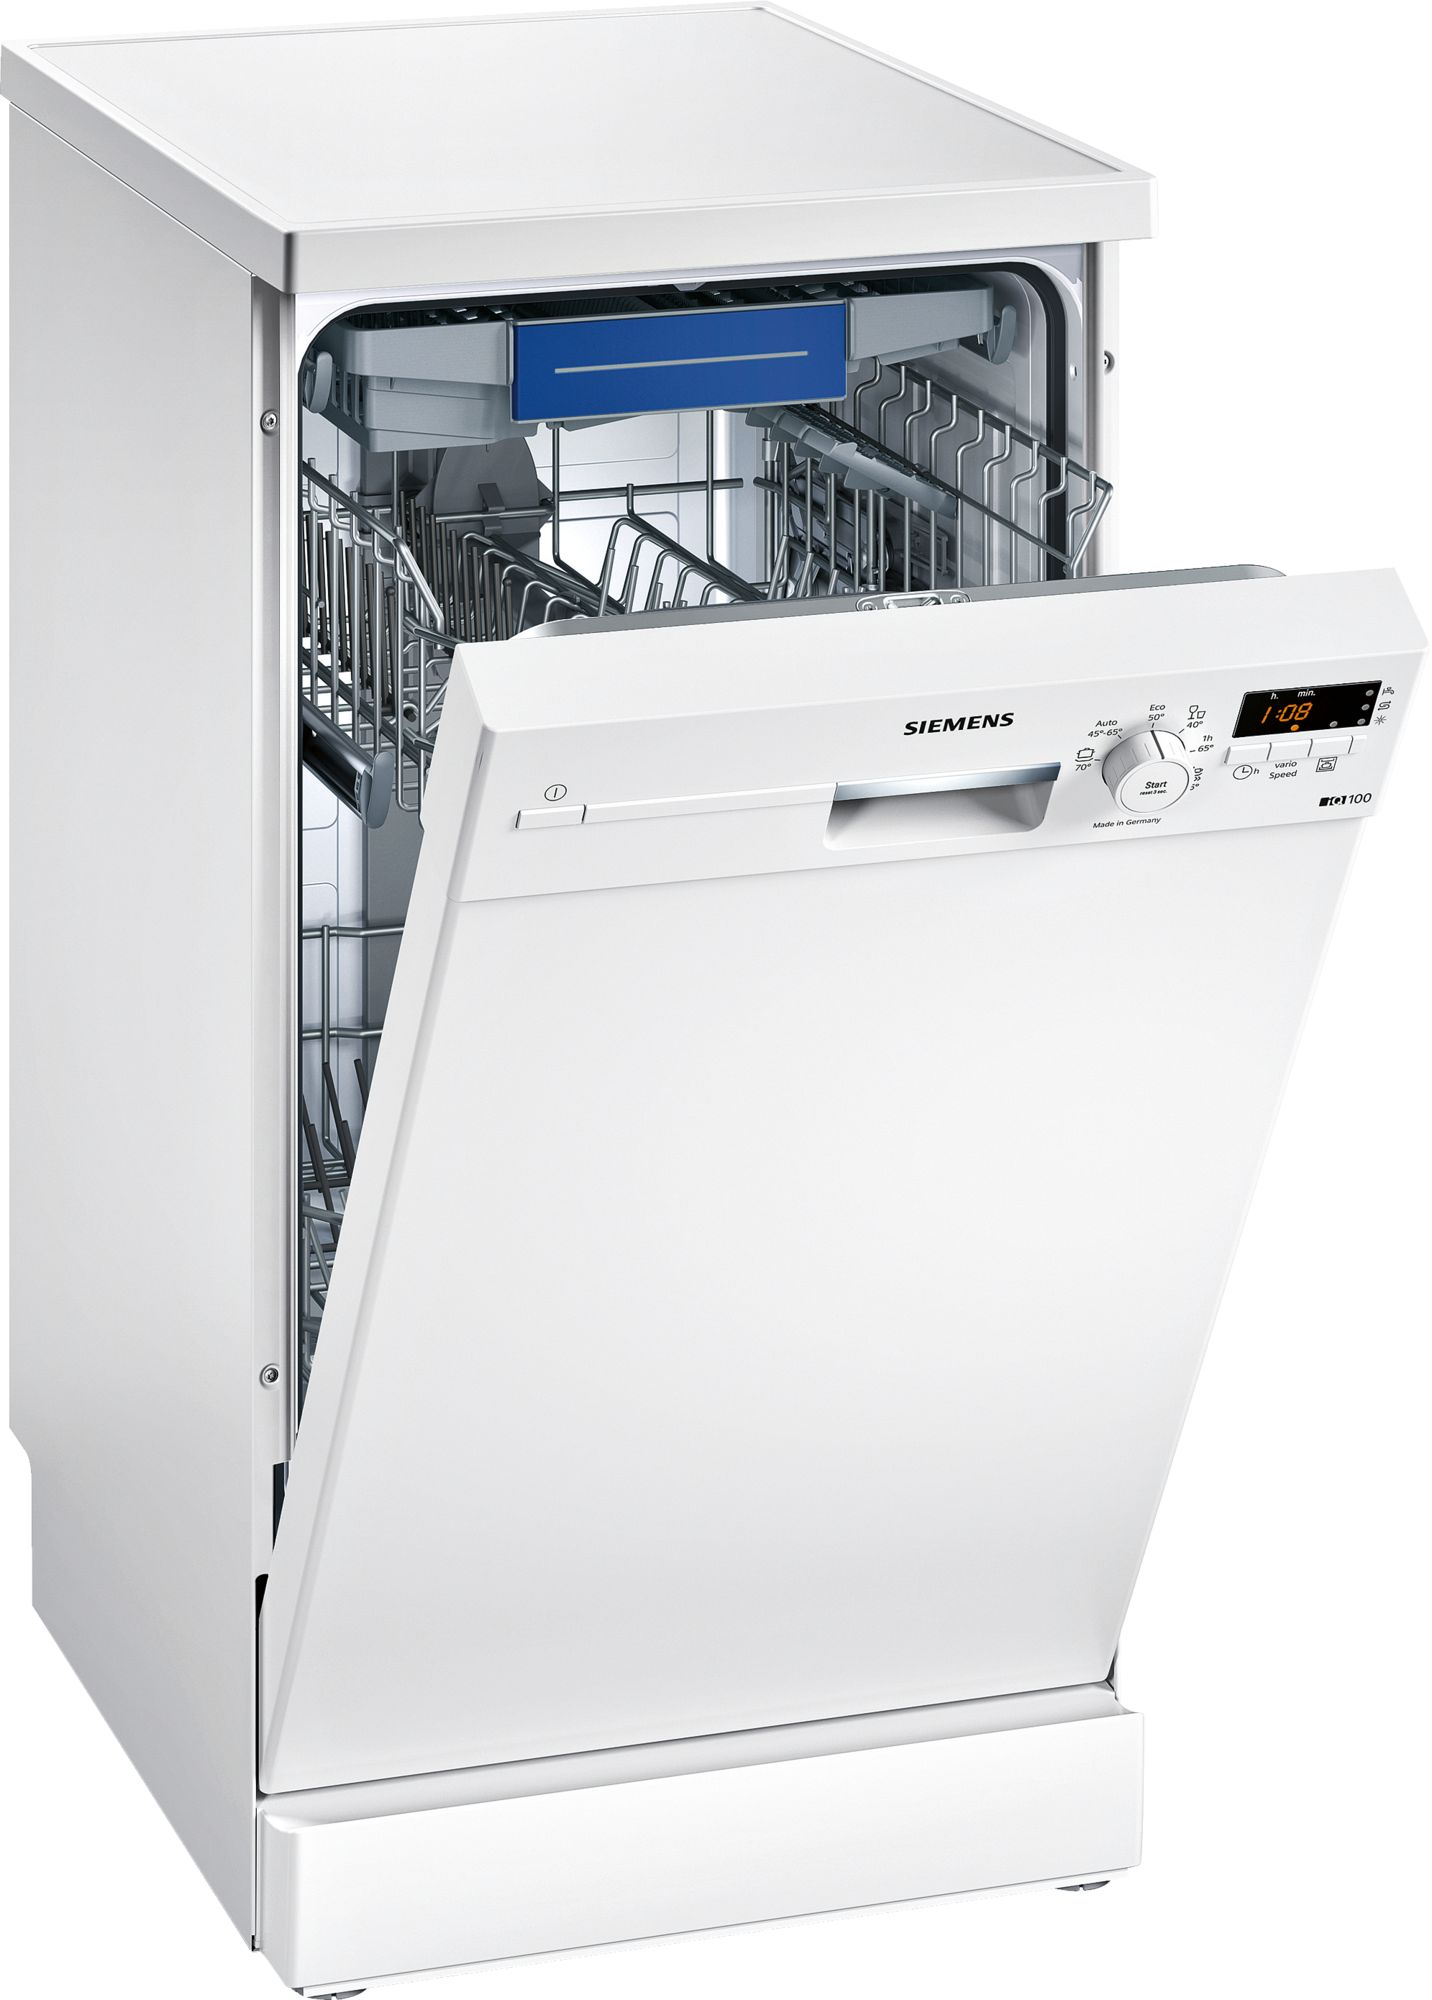 Siemens (Сименс) SR216W01MR